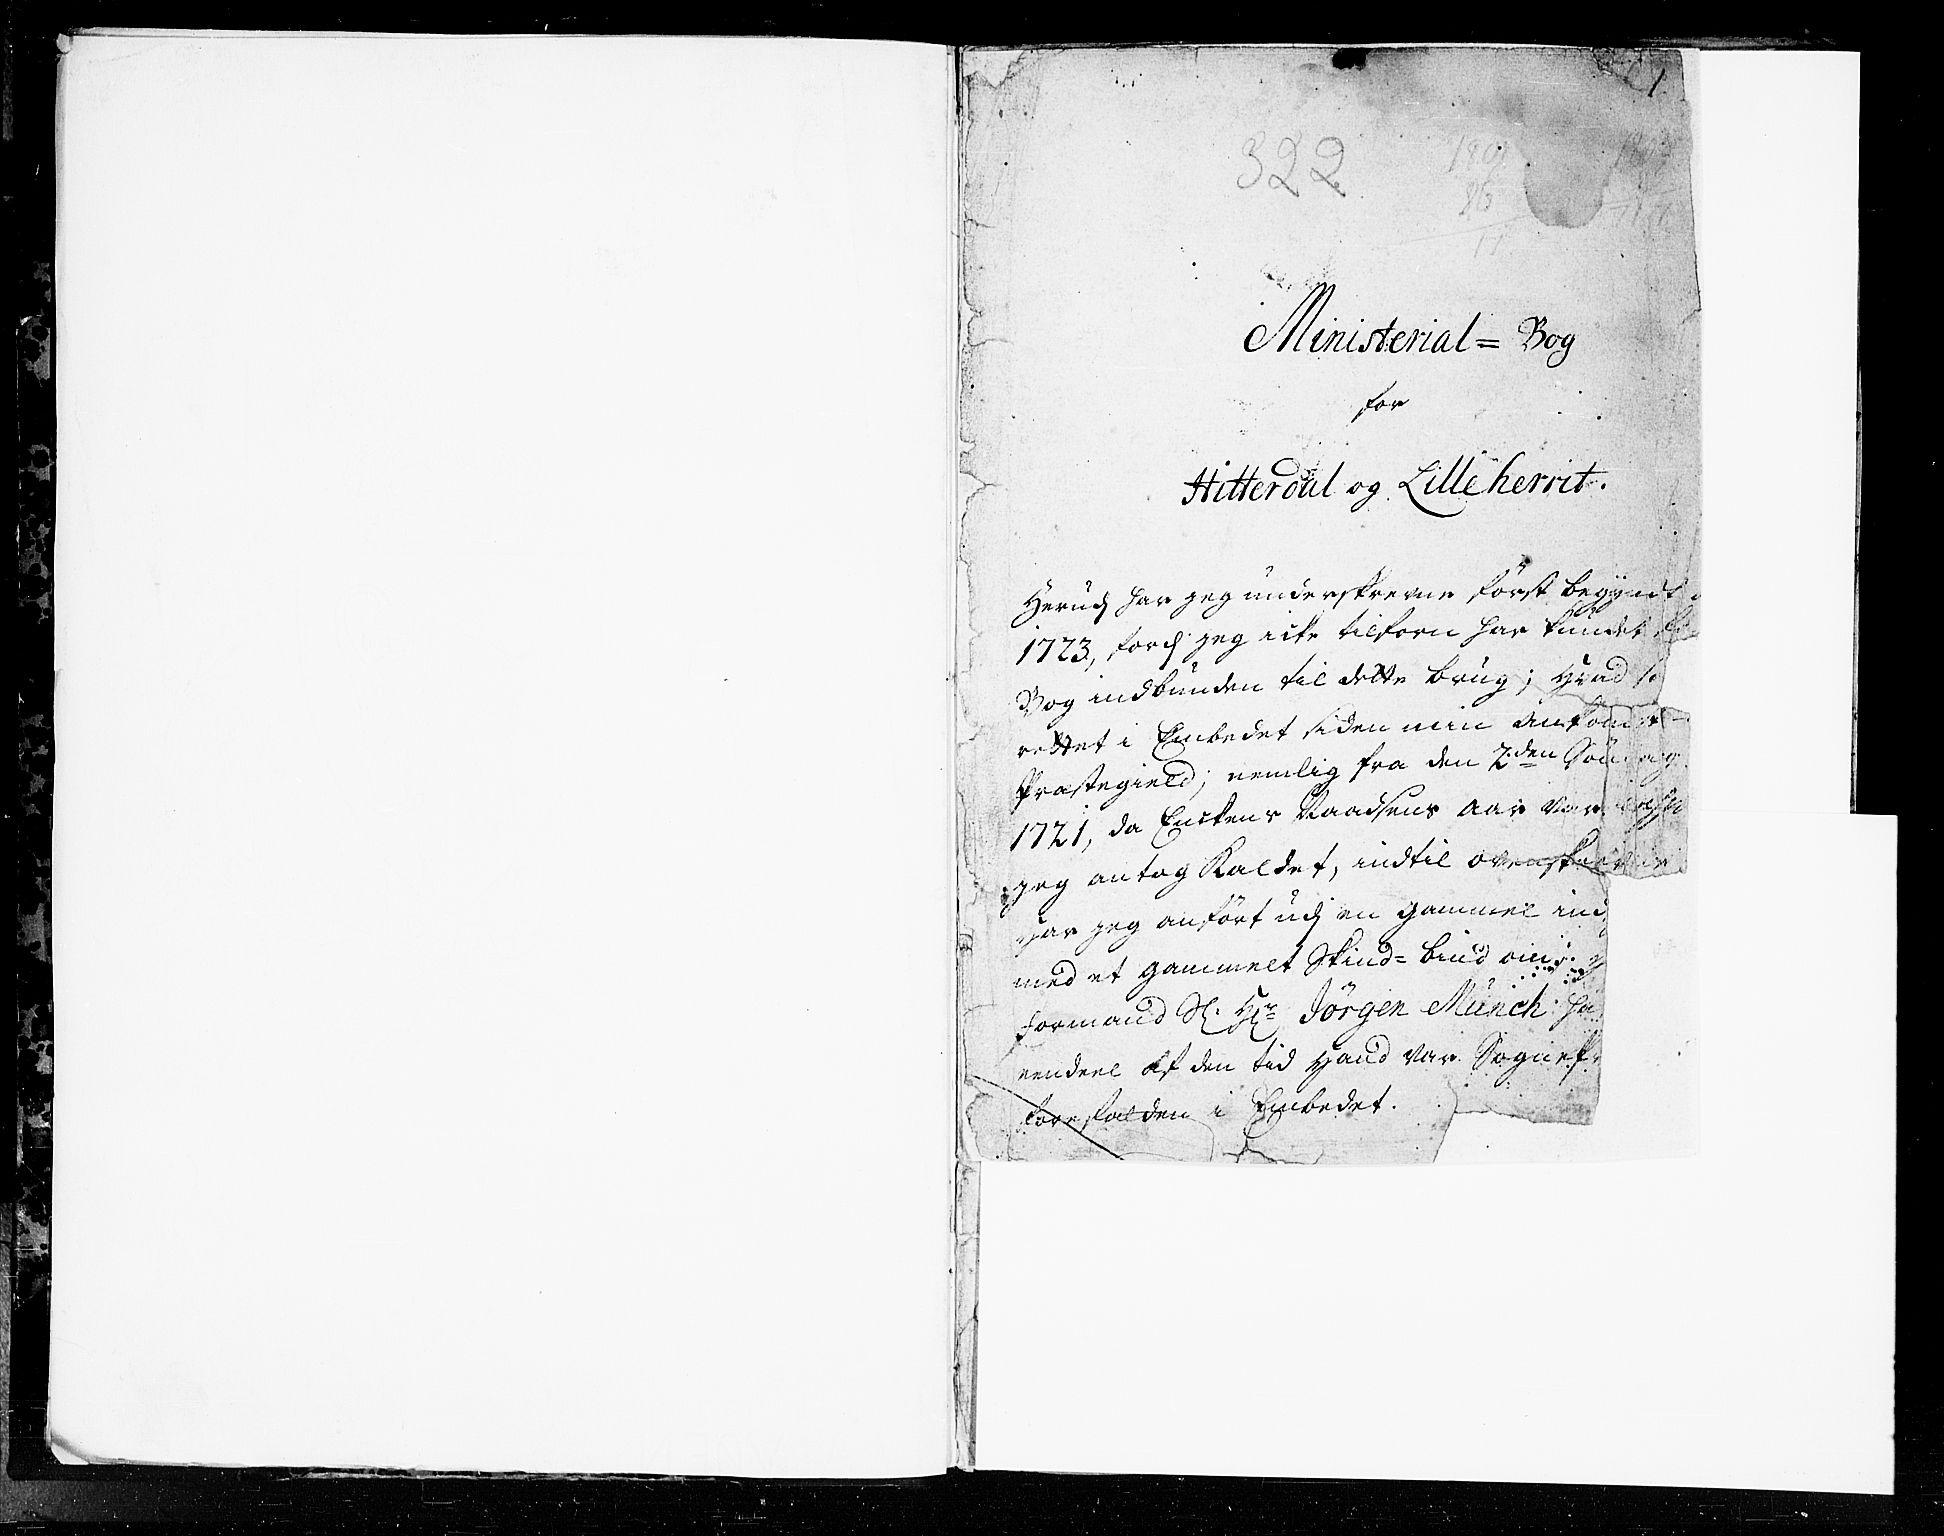 SAKO, Heddal kirkebøker, F/Fa/L0003: Ministerialbok nr. I 3, 1723-1783